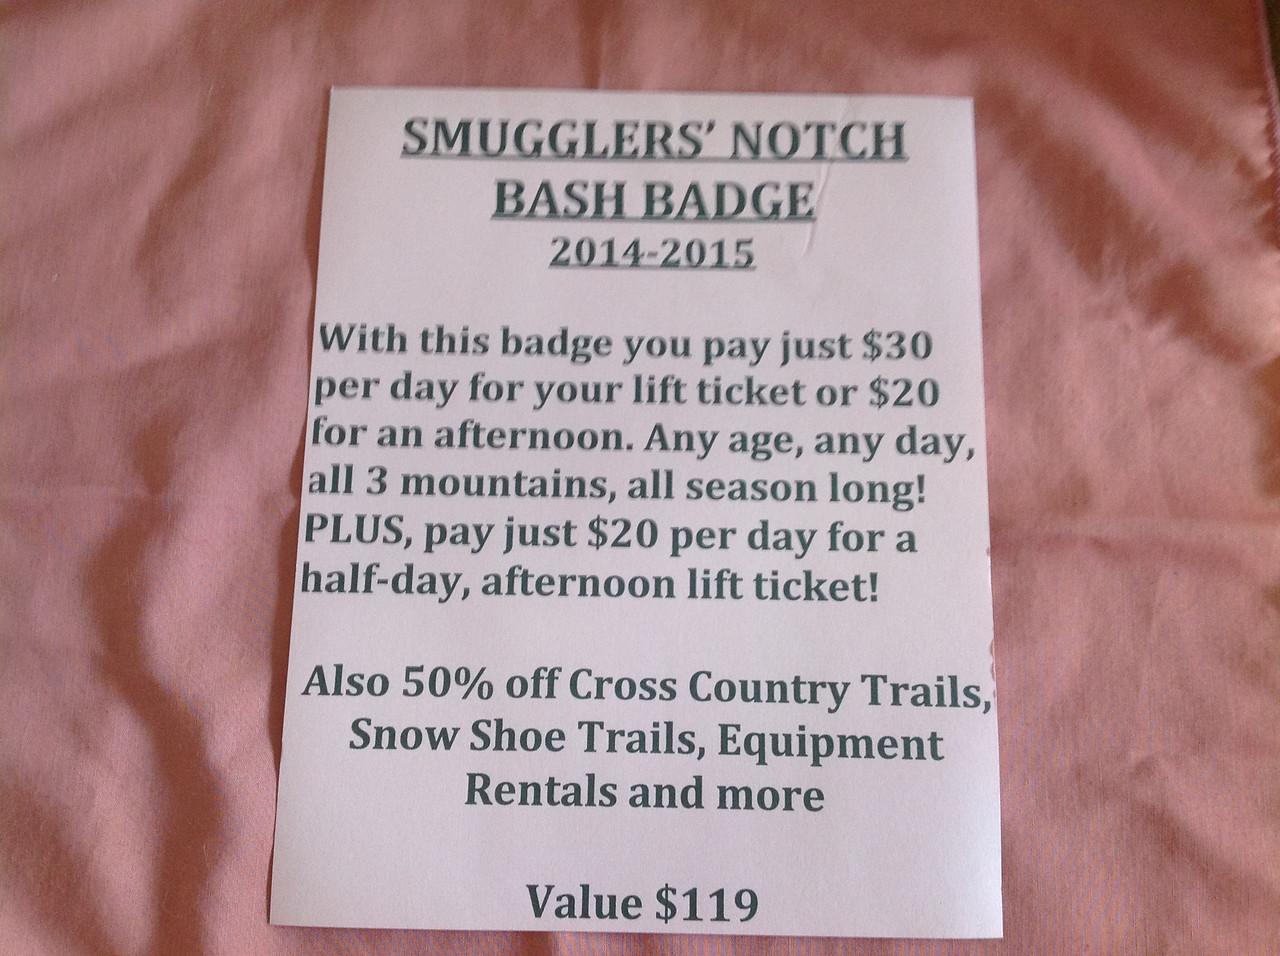 Smuggler's Notch (Stowe, VT) Bash badge. Great deal for skiers, snowboarders etc.<br /> <br /> Starting bid $15